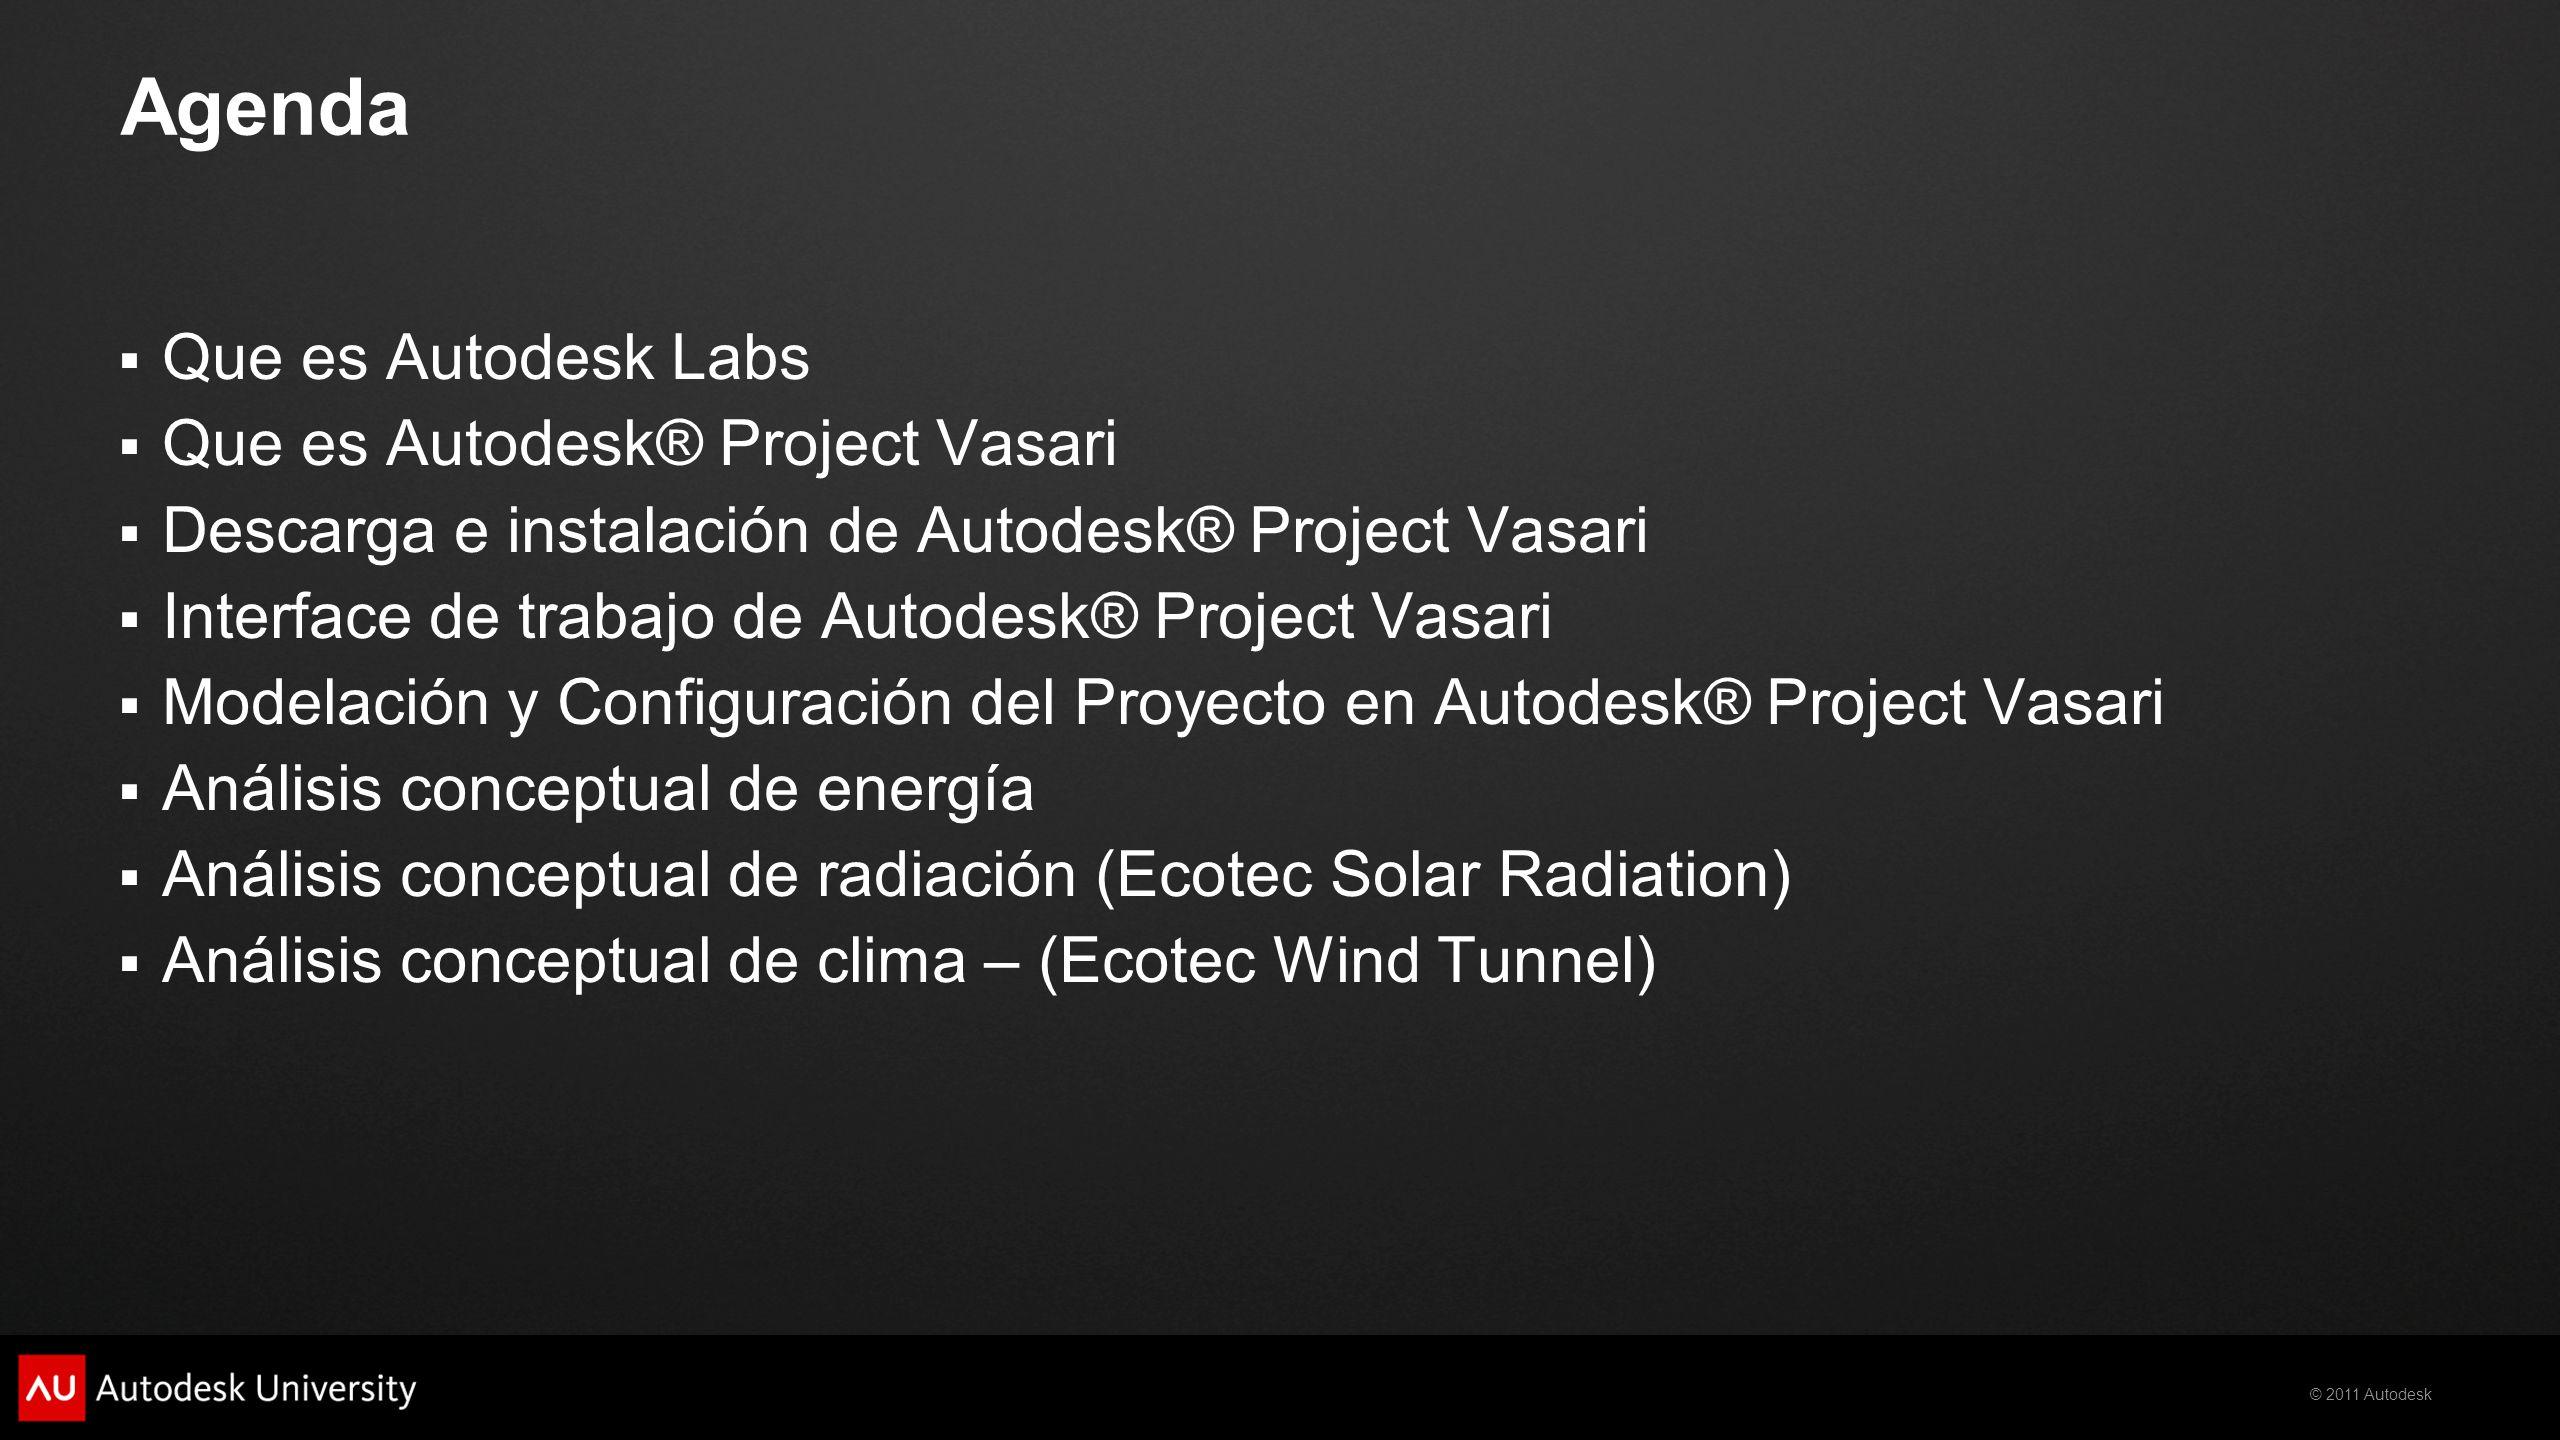 Agenda Que es Autodesk Labs Que es Autodesk® Project Vasari